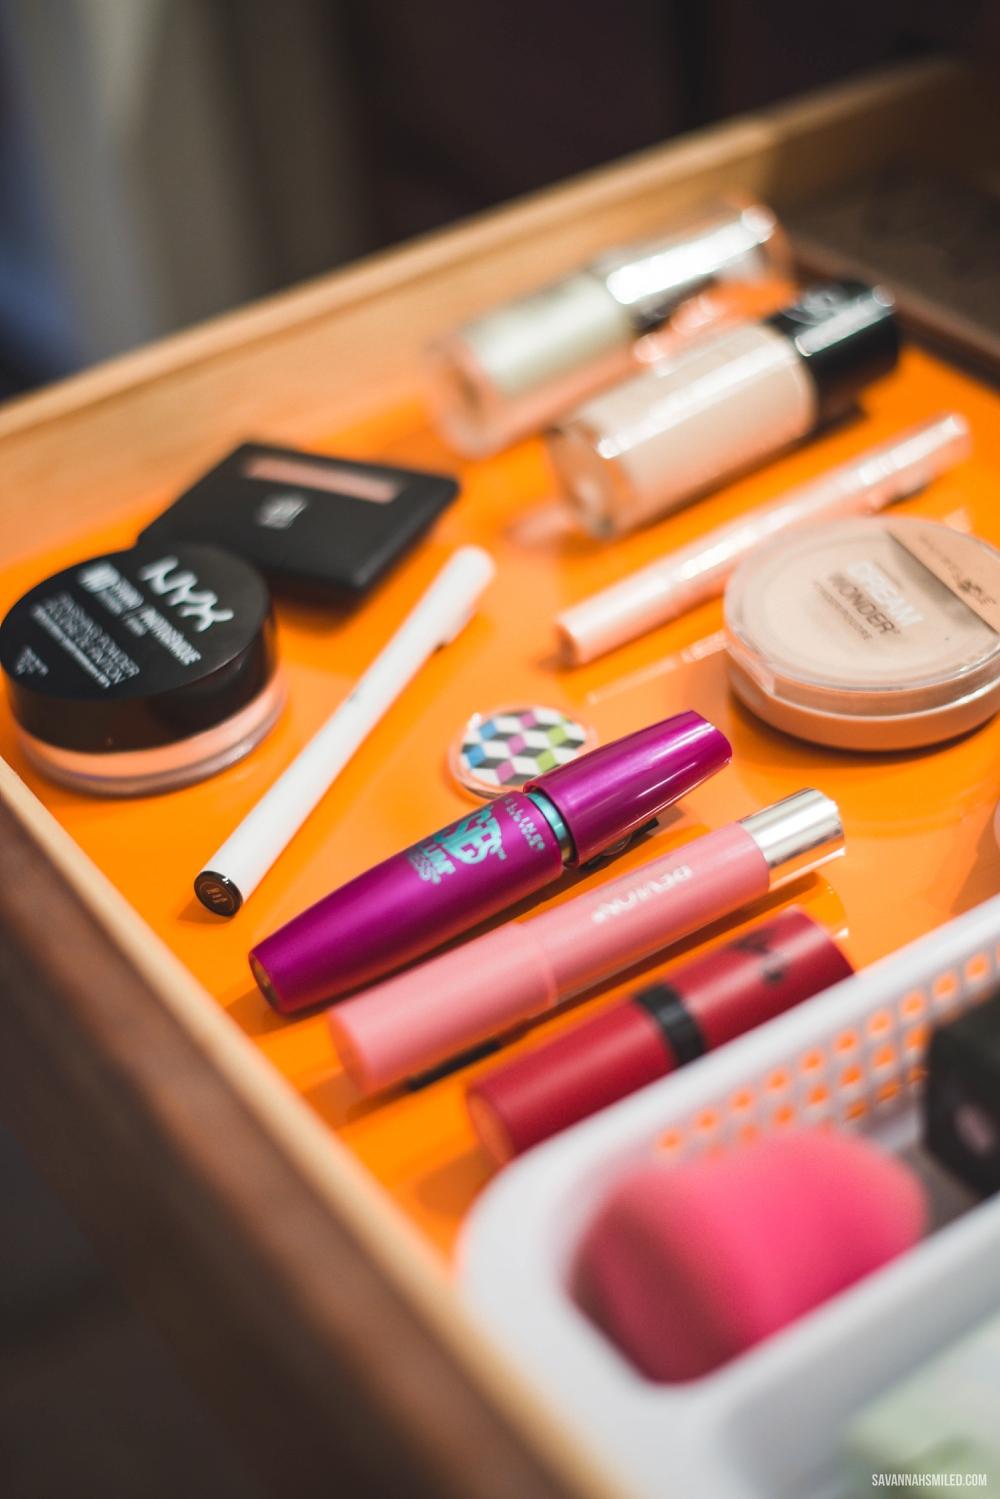 diy-makeup-magnet-organizer-9.jpg